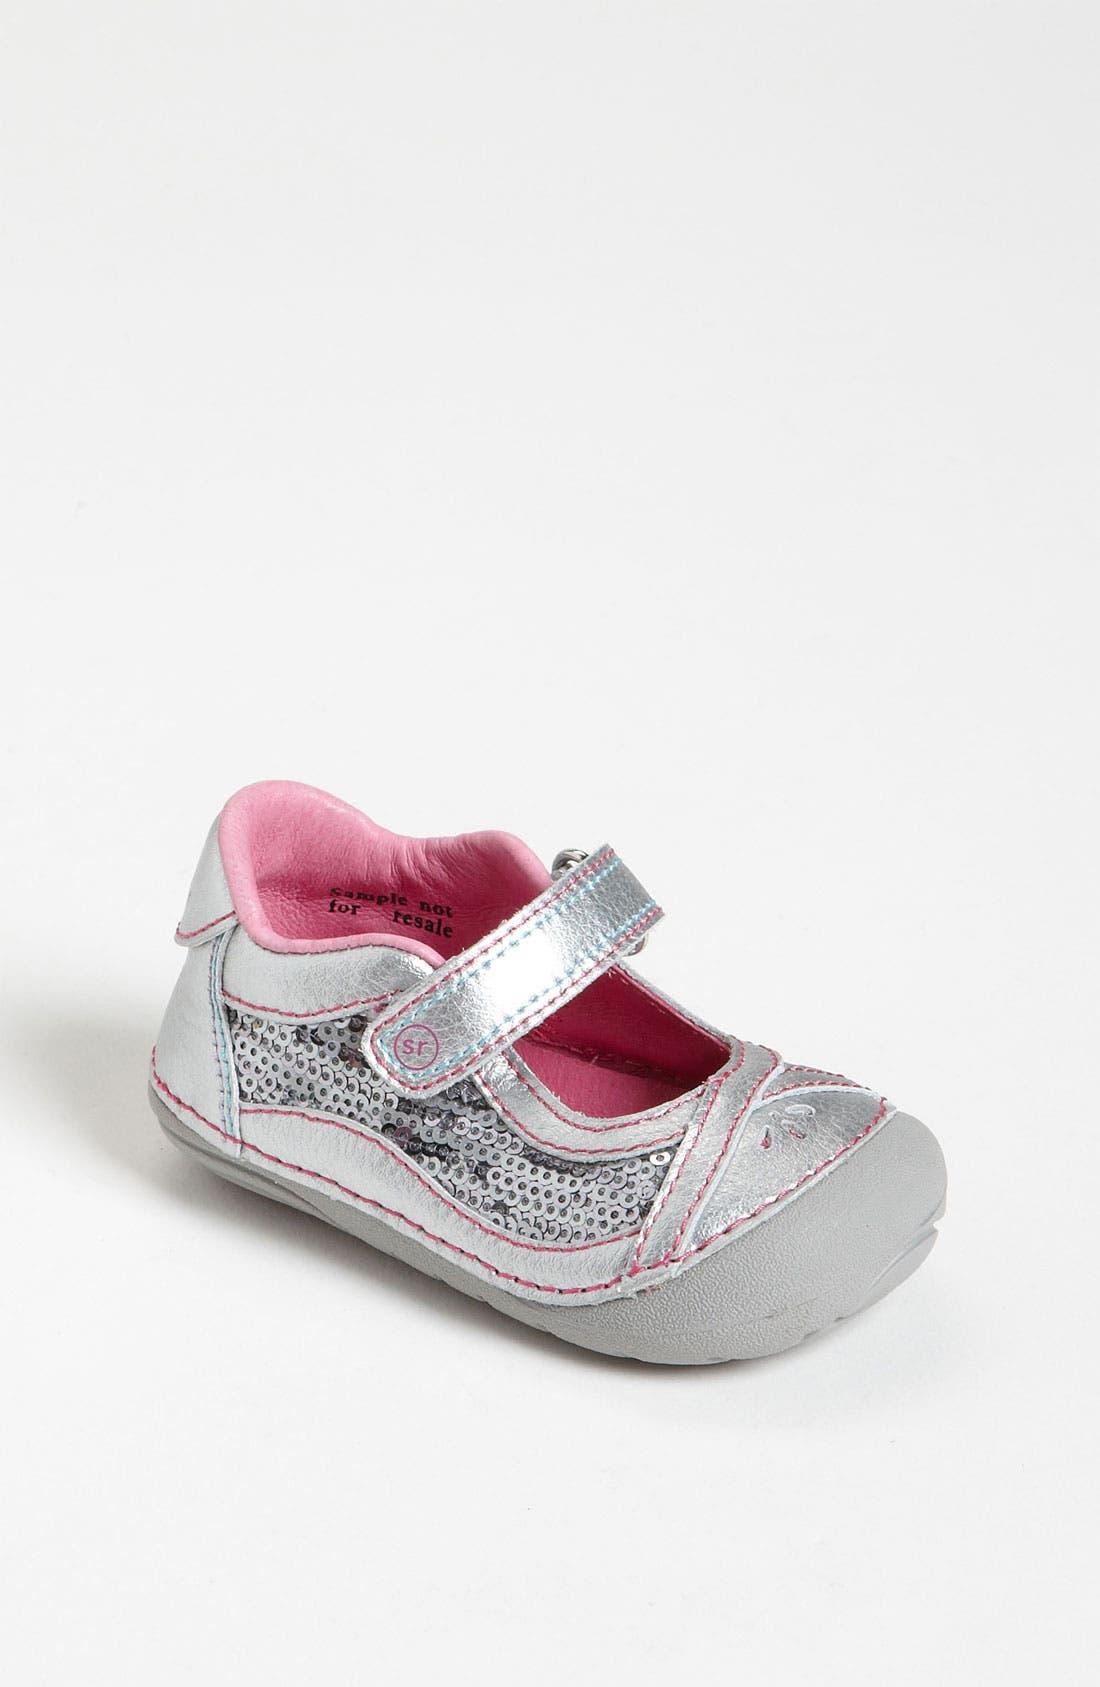 Alternate Image 1 Selected - Stride Rite 'Dream Queen' Sneaker (Baby & Walker)